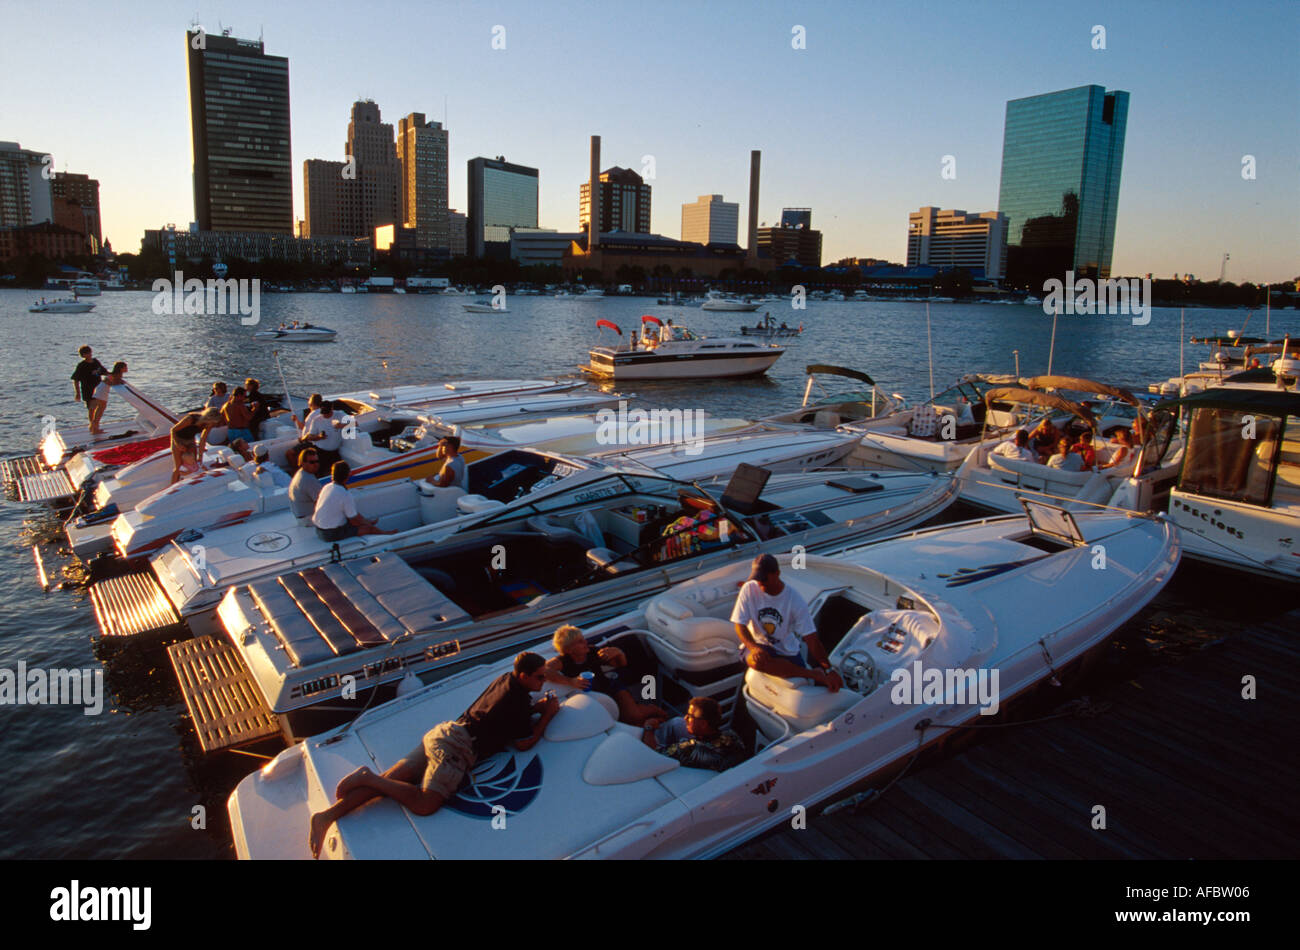 Ohio lucas county maumee - Stock Photo Toledo Ohio Maumee River Boats At The Docks Eastside City Skyline Beyond